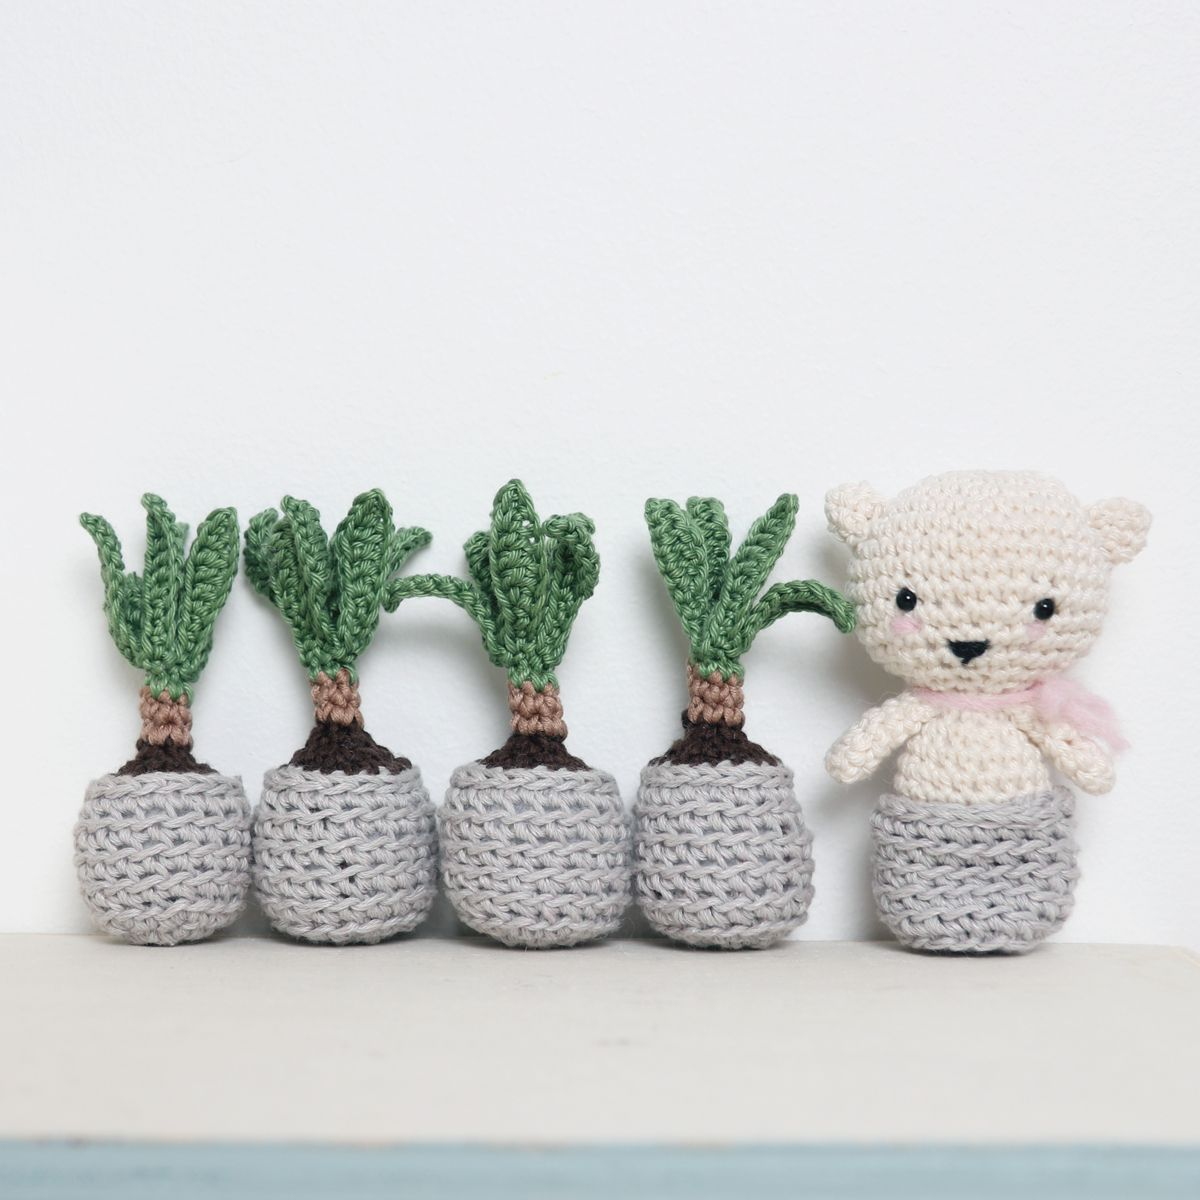 Crochet Mini Yucca Plant by Ina Rho | Crochet | Pinterest